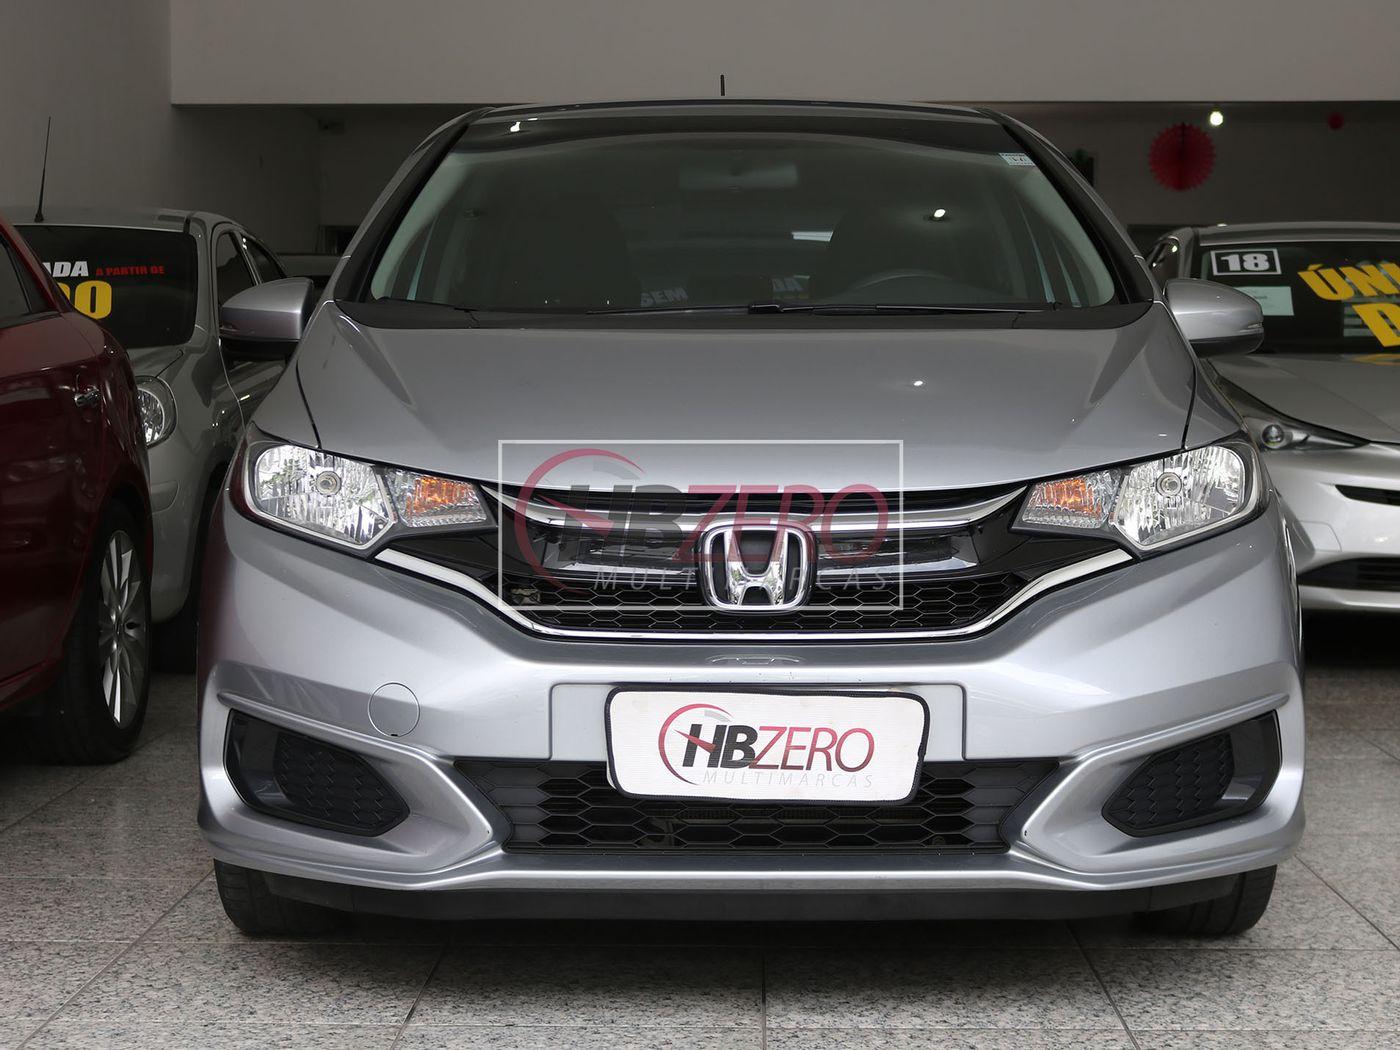 Honda Fit Personal 1.5 Flexone 16V 5p Aut.